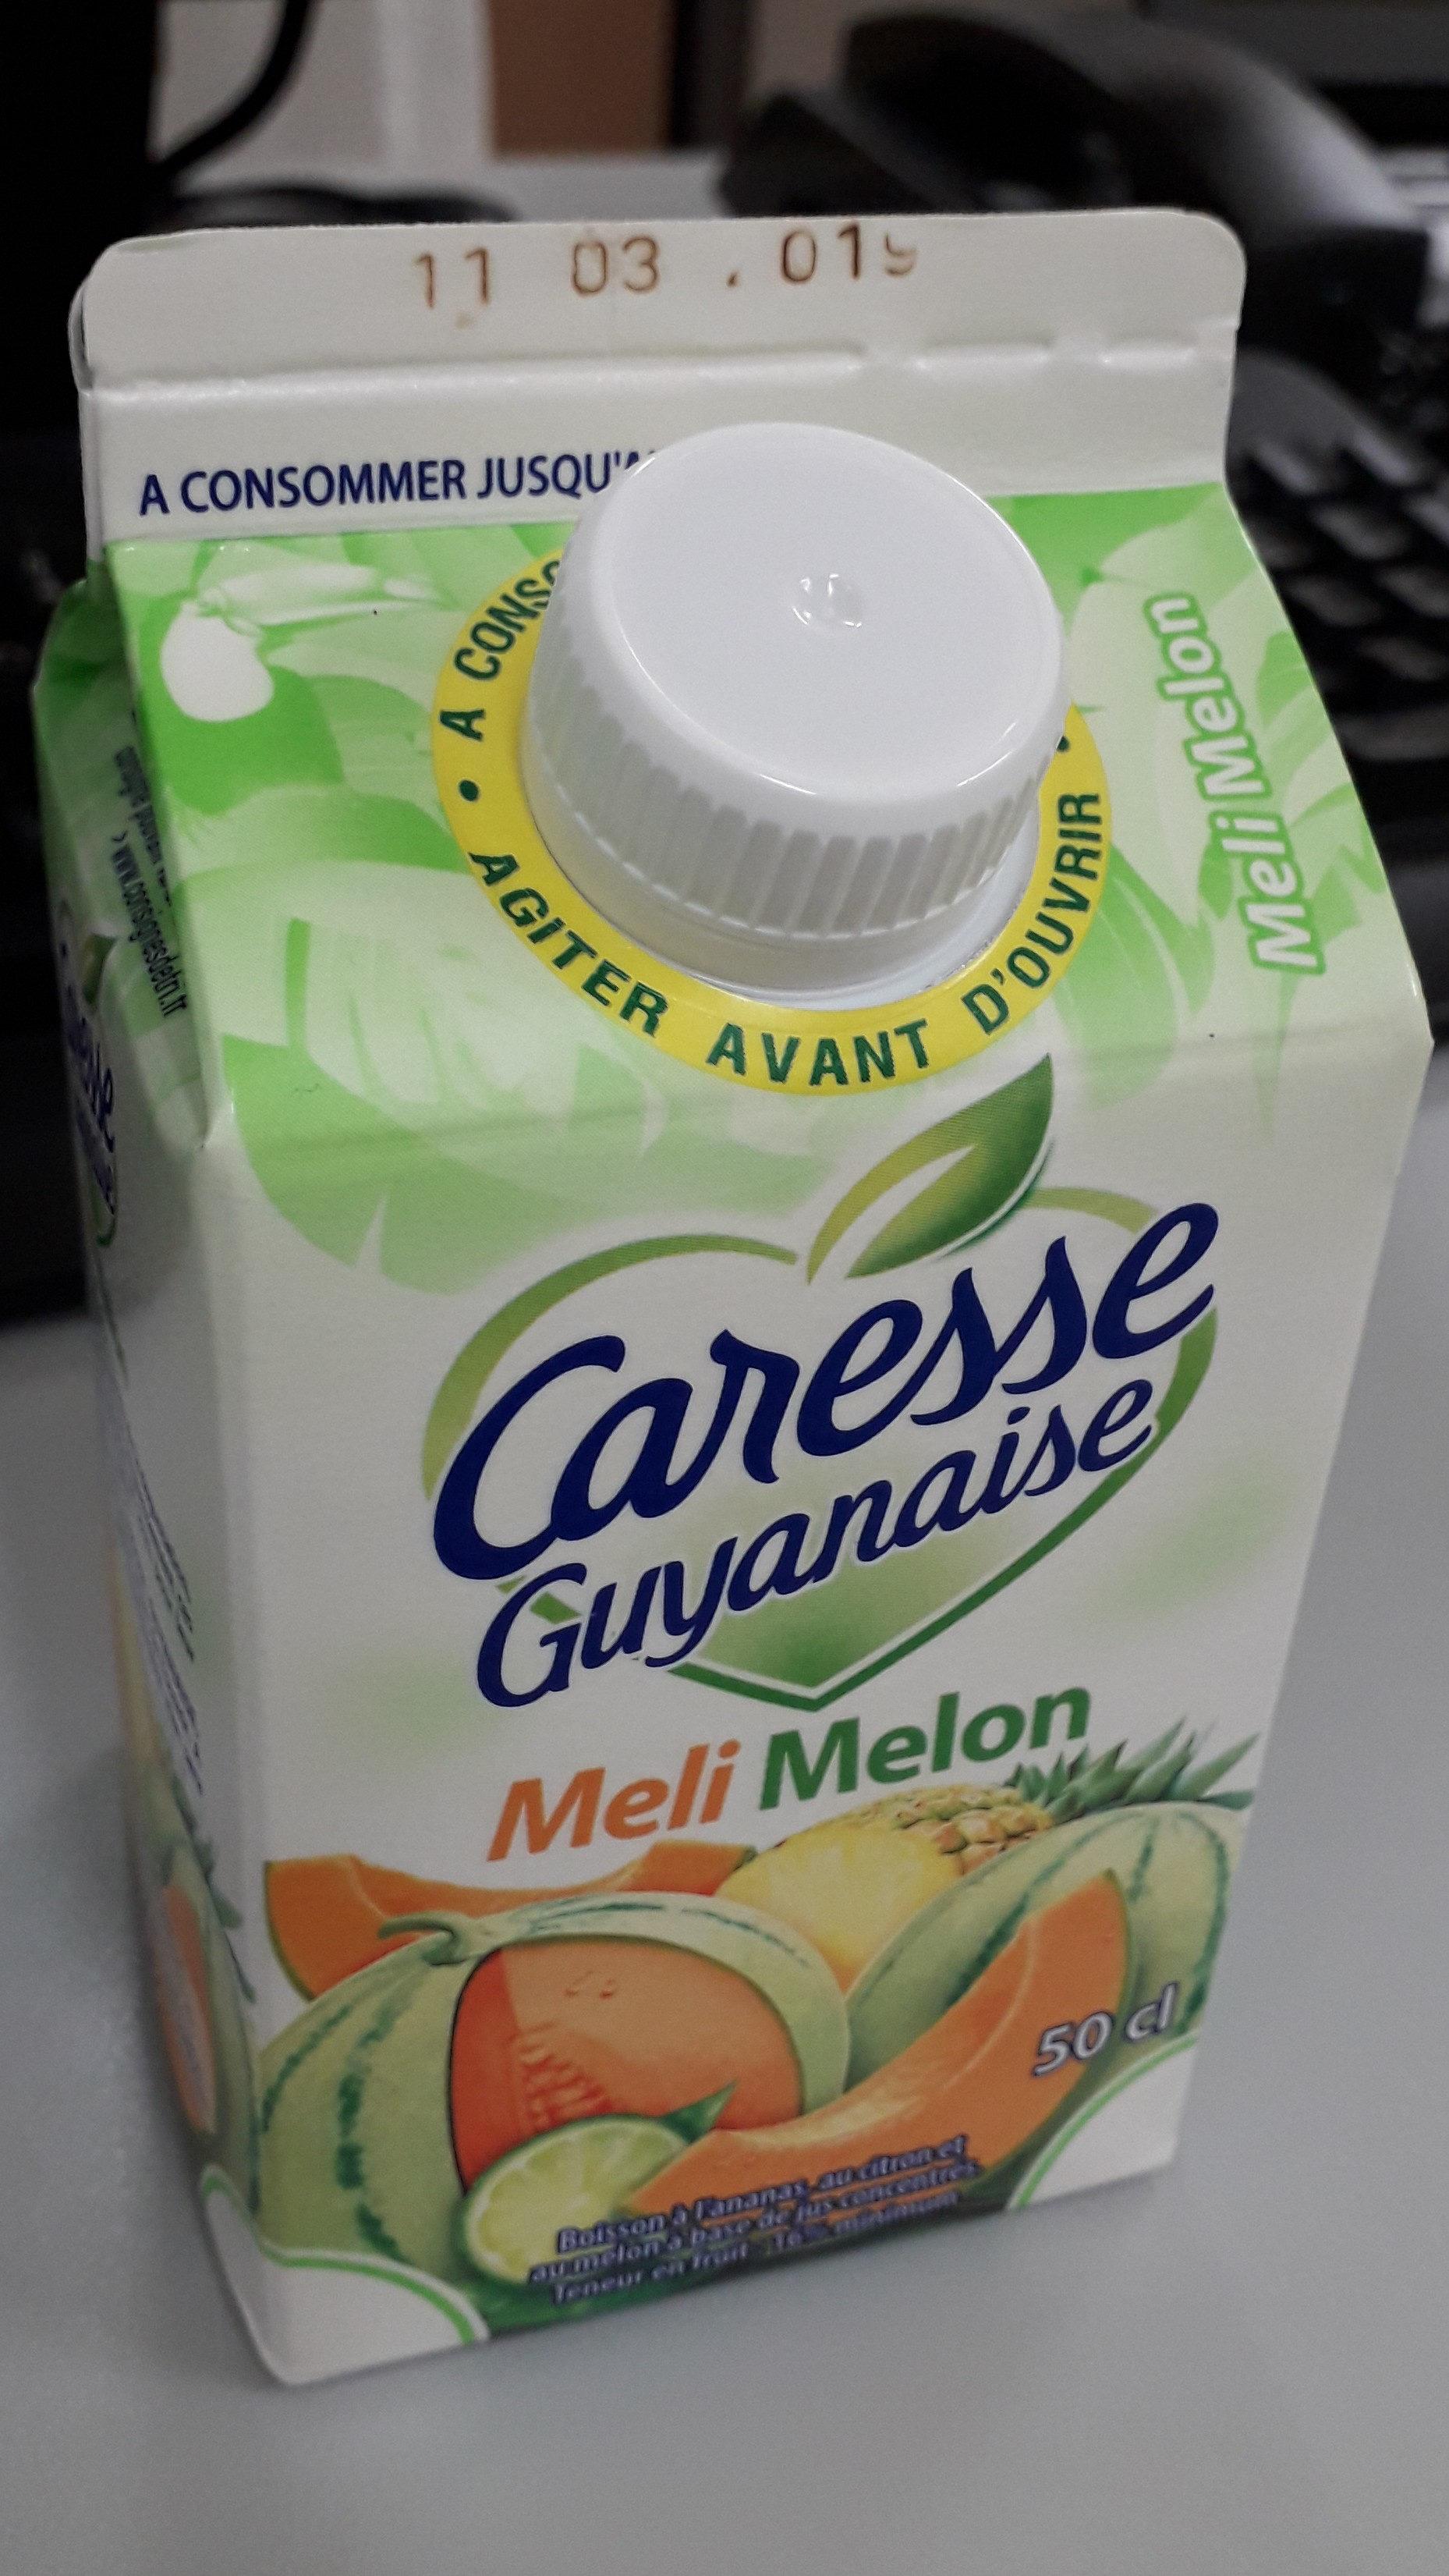 Boisson méli melon - Prodotto - fr